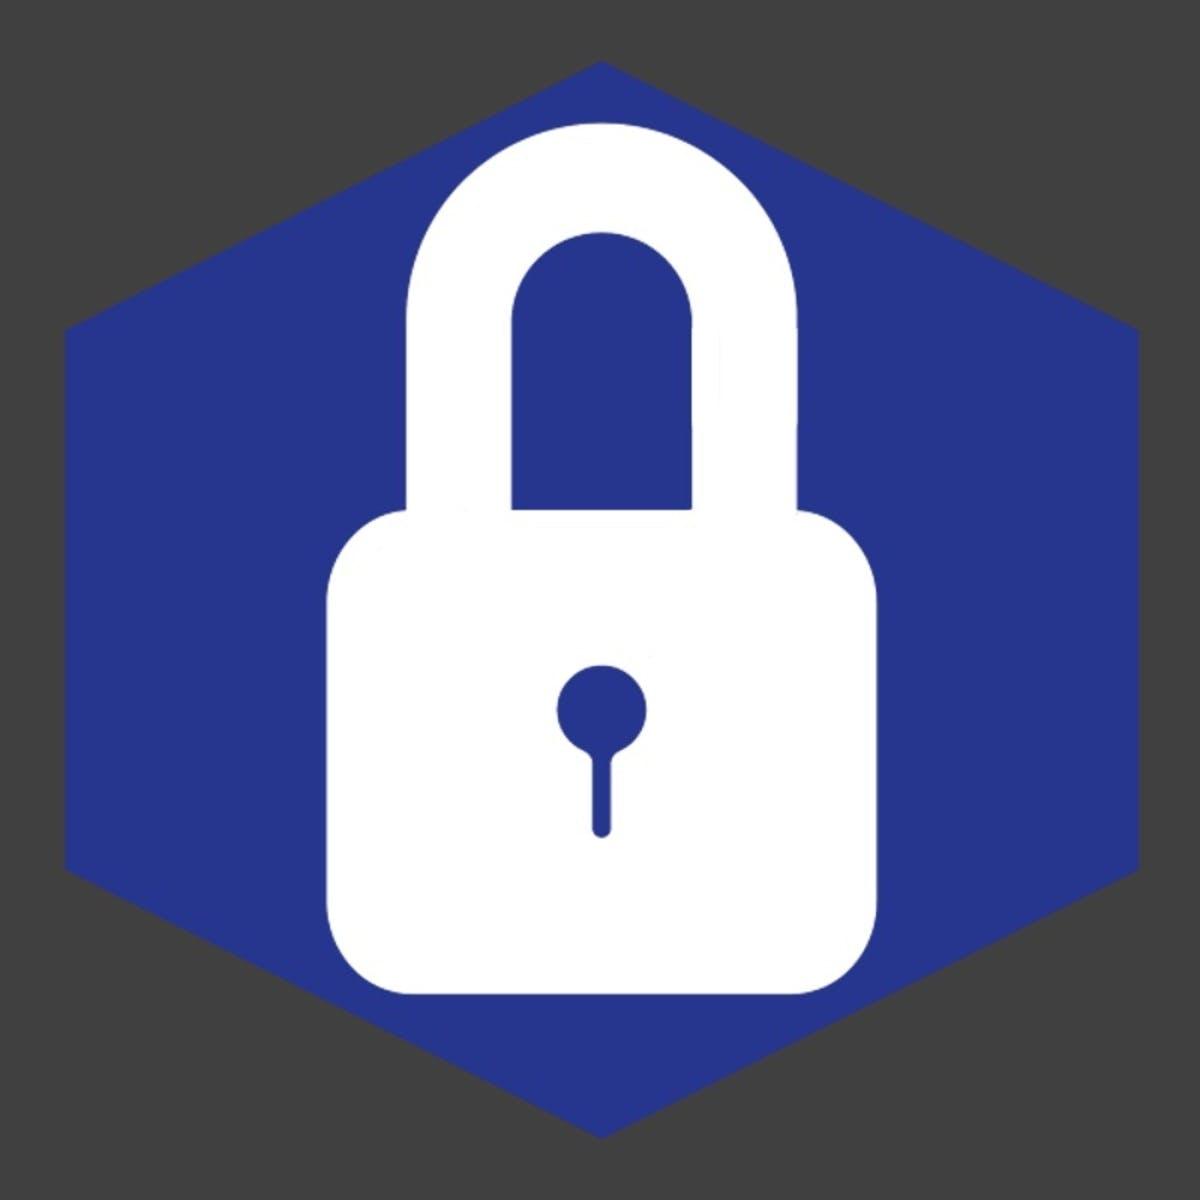 Proactive Computer Security